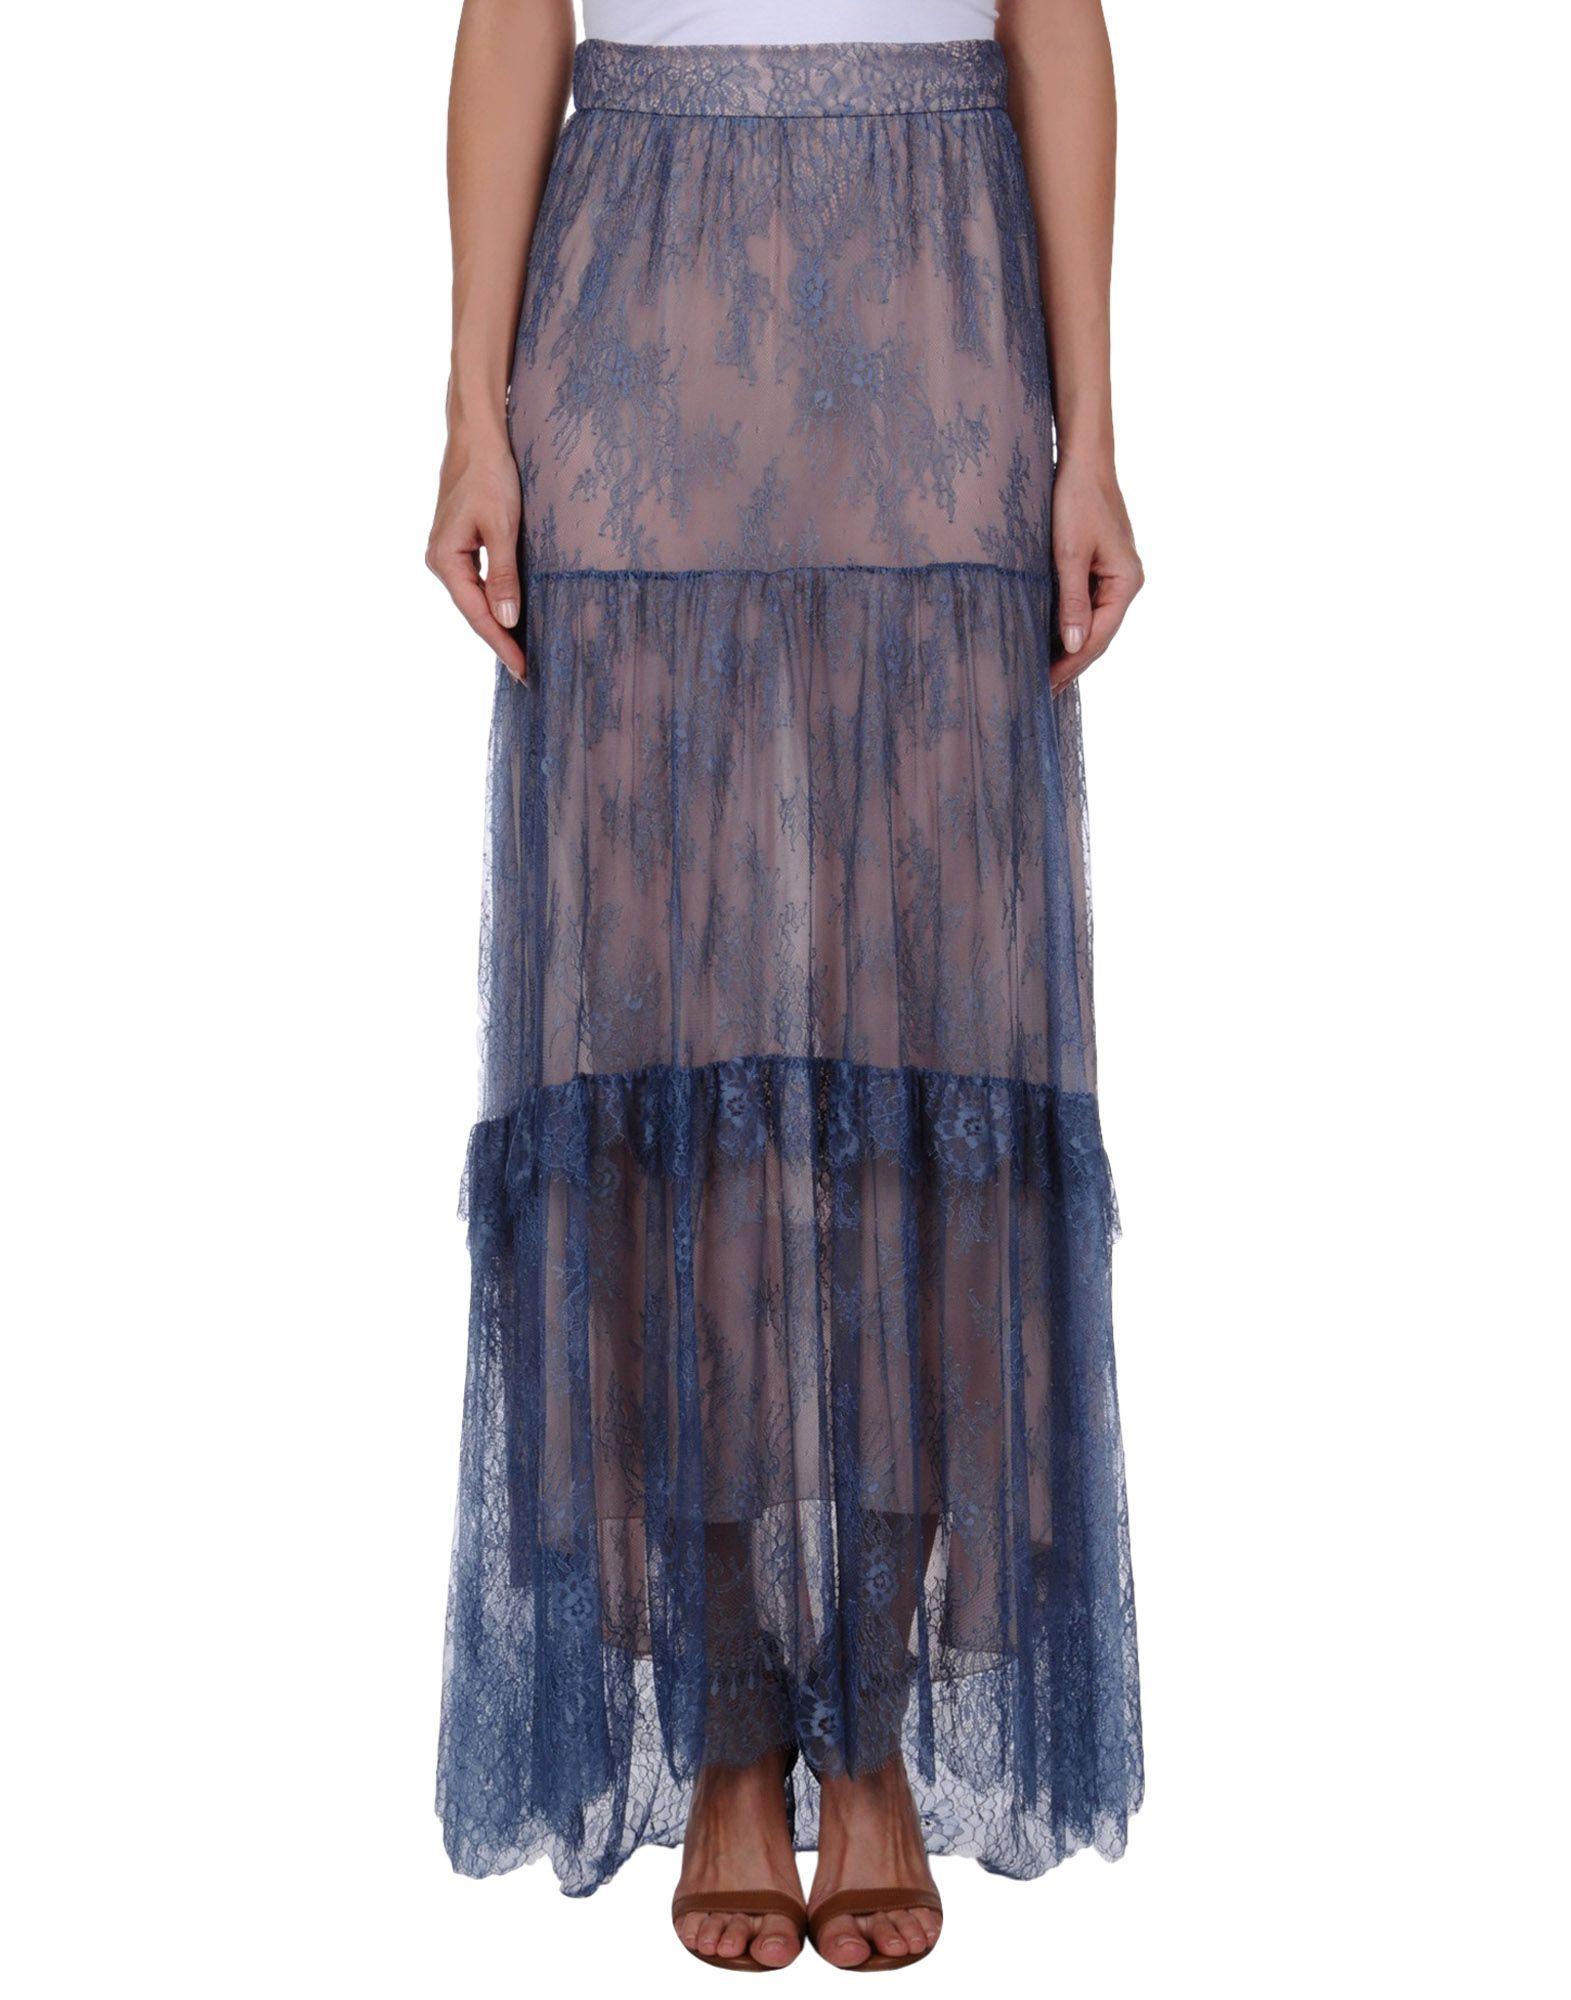 PHILOSOPHY di LORENZO SERAFINI Damen Maxirock Farbe Taubenblau Größe 6 jetztbilligerkaufen